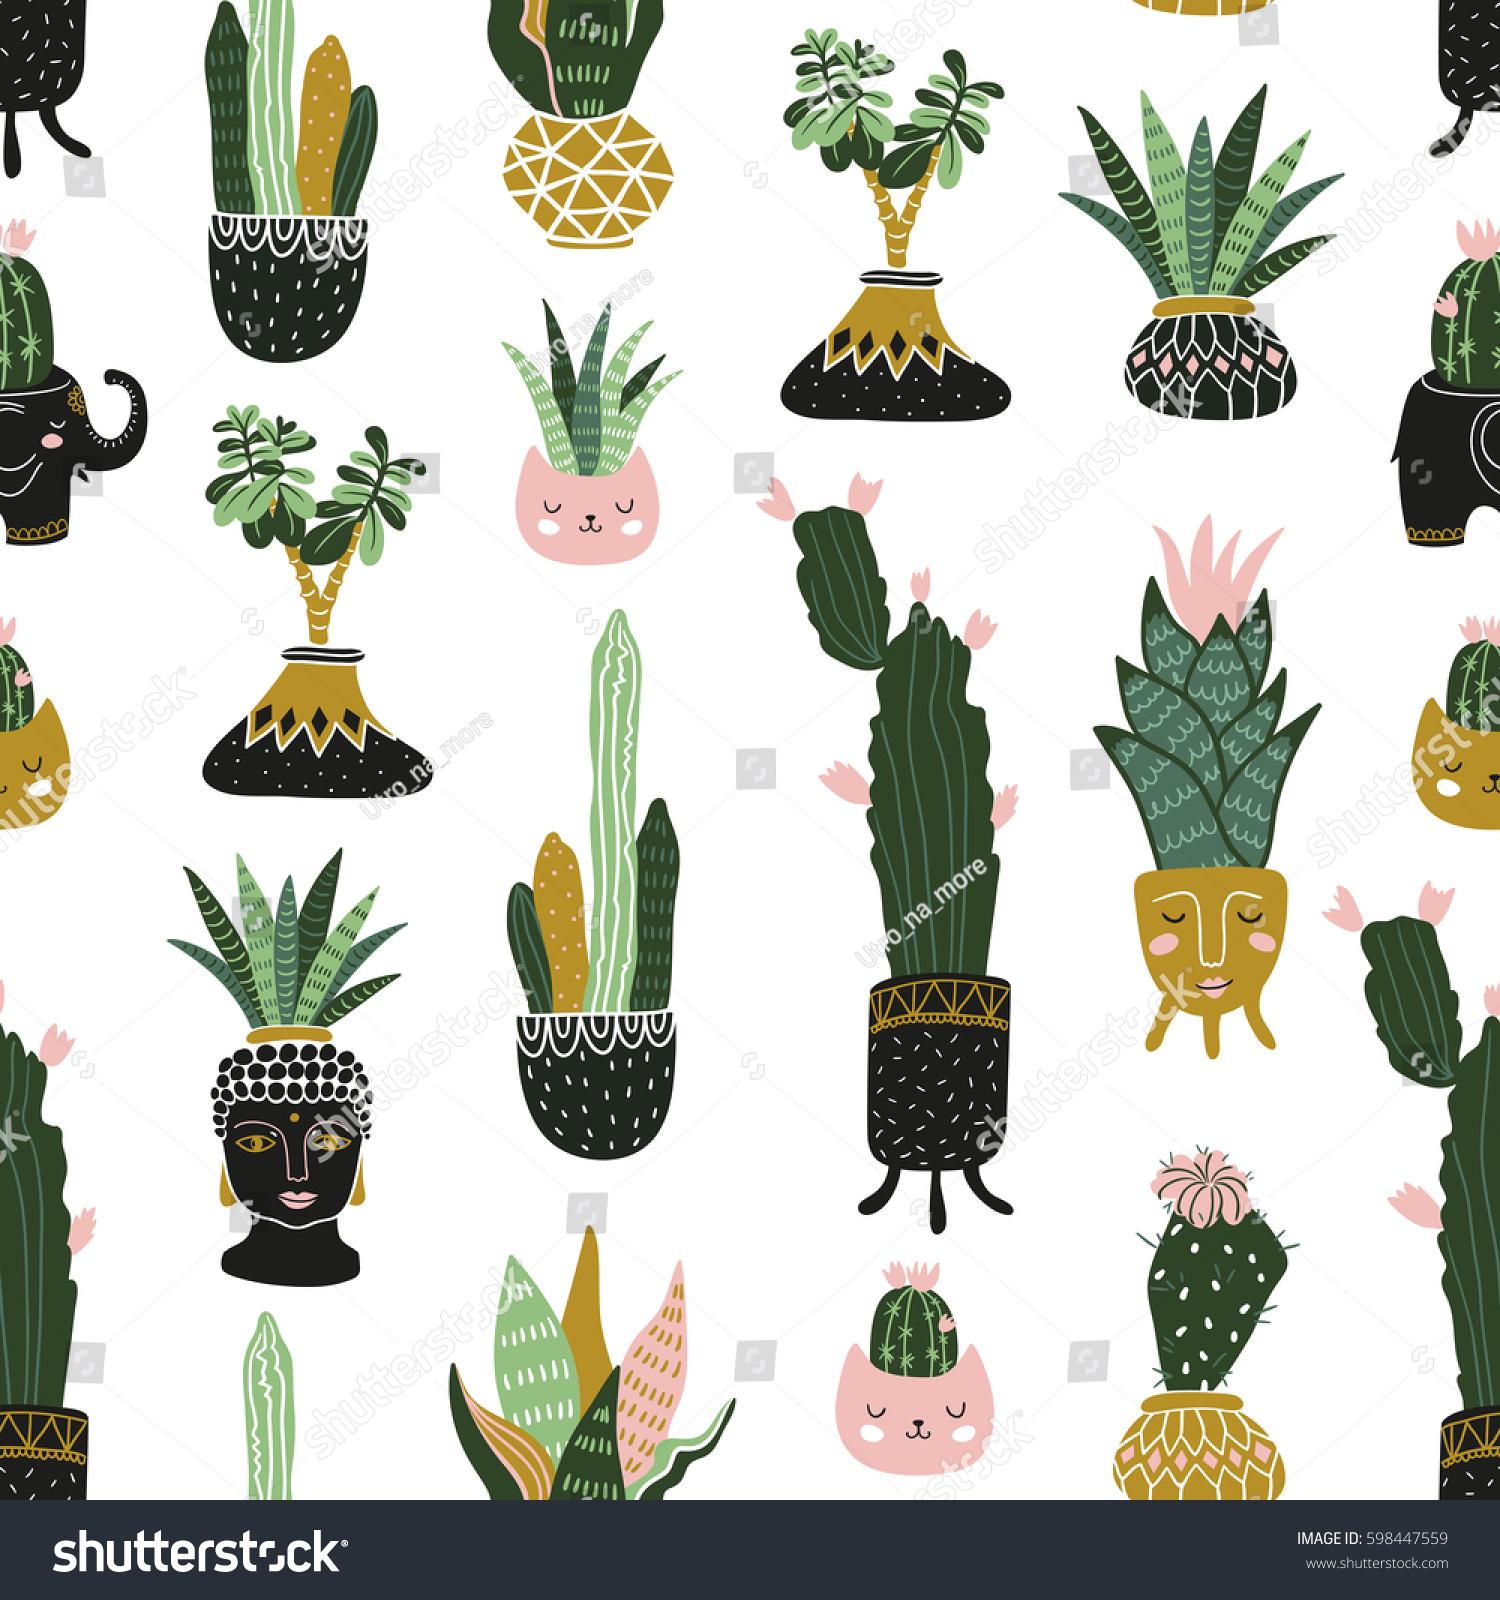 hand drawn tropical house plants scandinavian stock vector